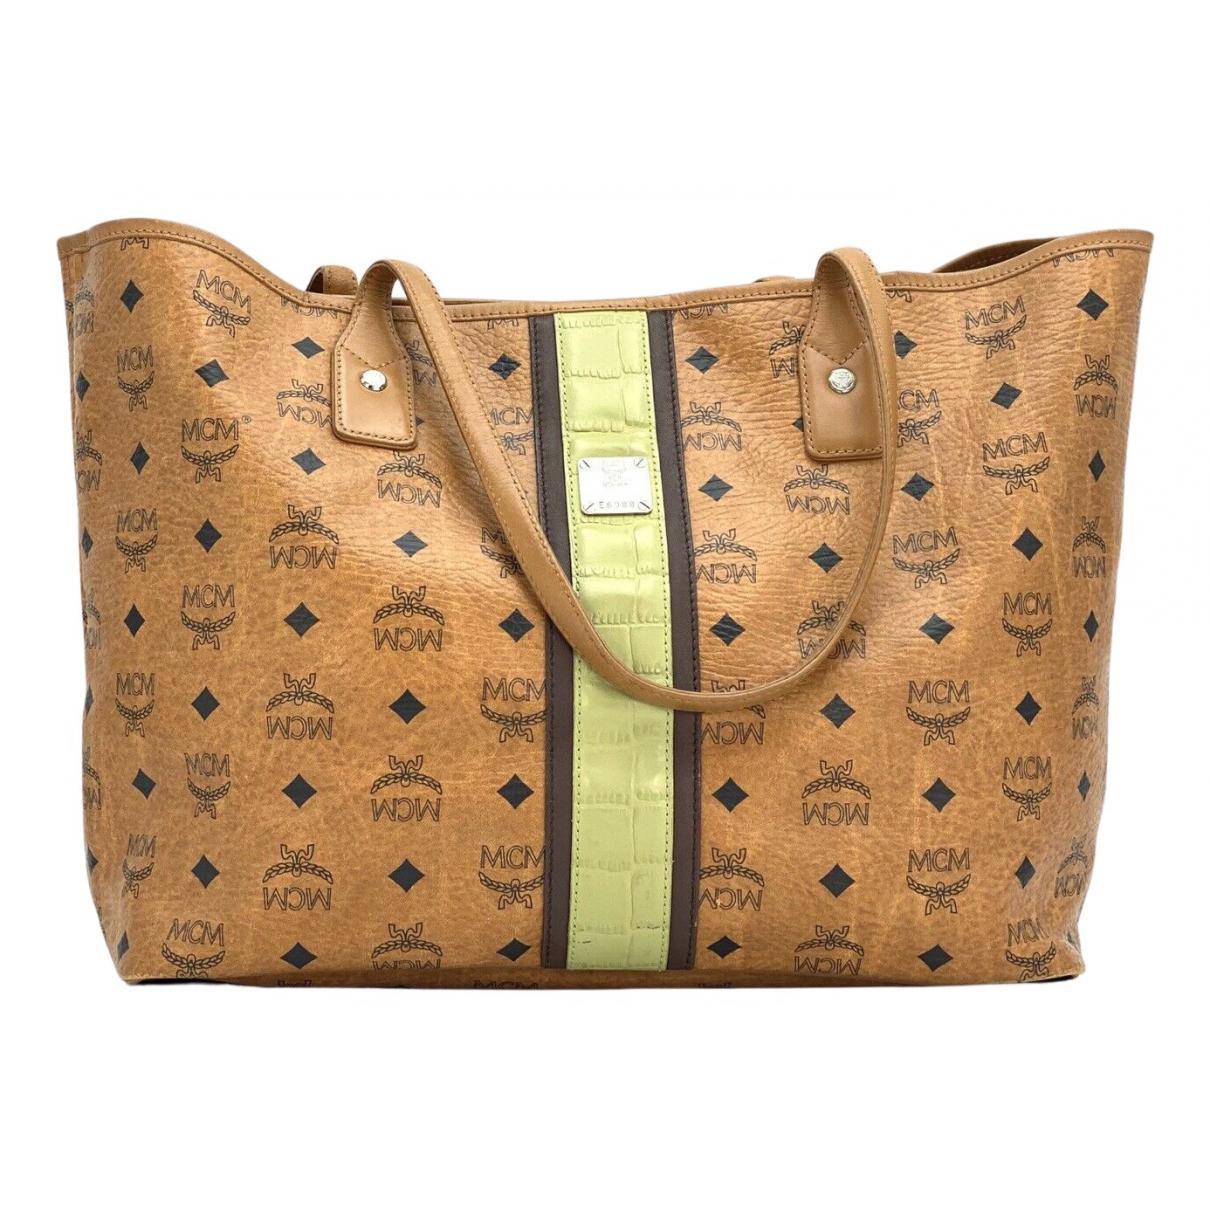 Mcm \N Handtasche in  Kamel Leinen